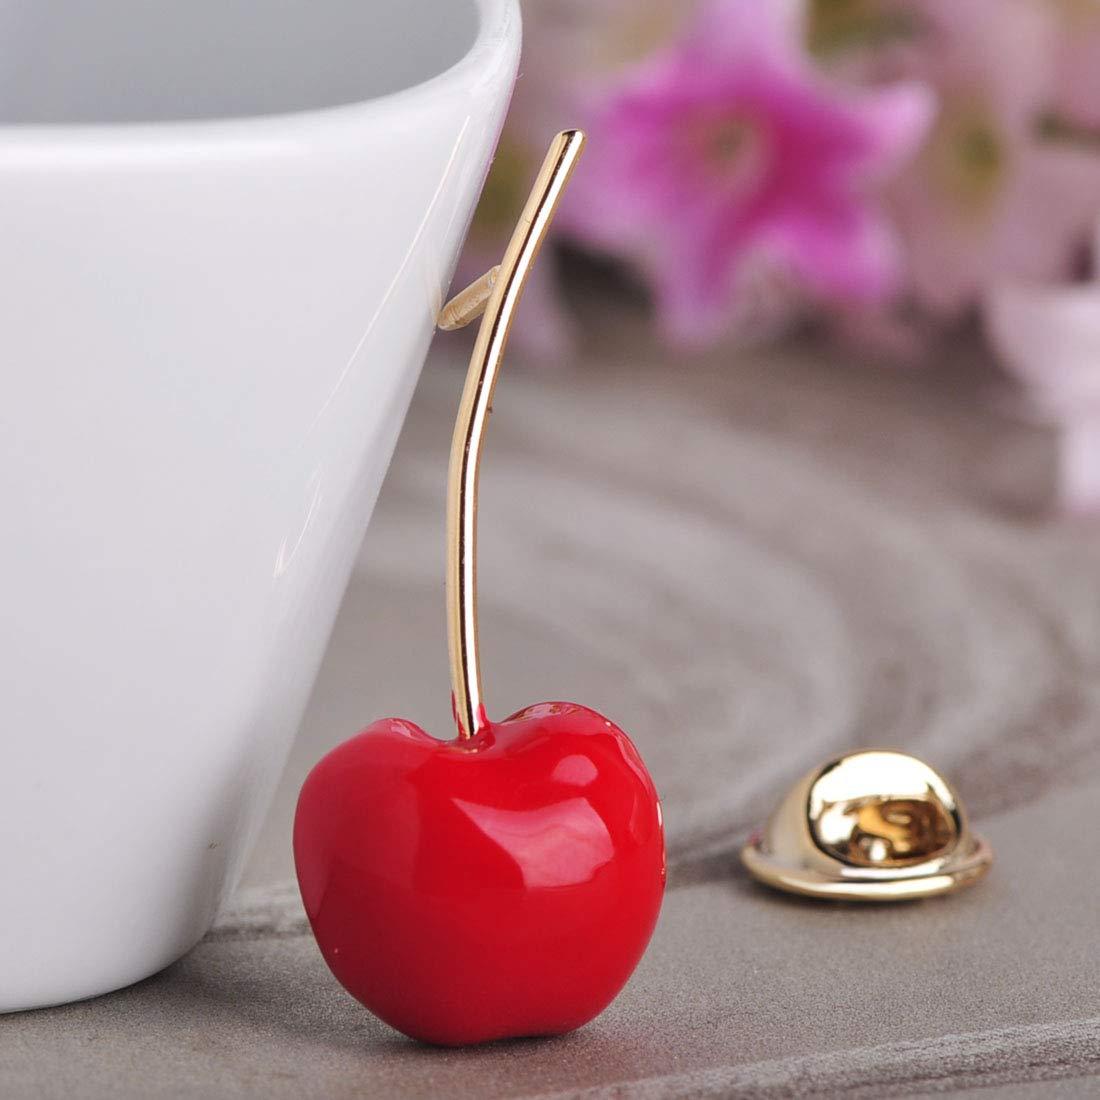 MECHOSE Lovely Red Cherry Shape Brooch Pins for Women Kid Cute Small Enamel Fruit Sweater Shirt Bag by MECHOSEN (Image #4)